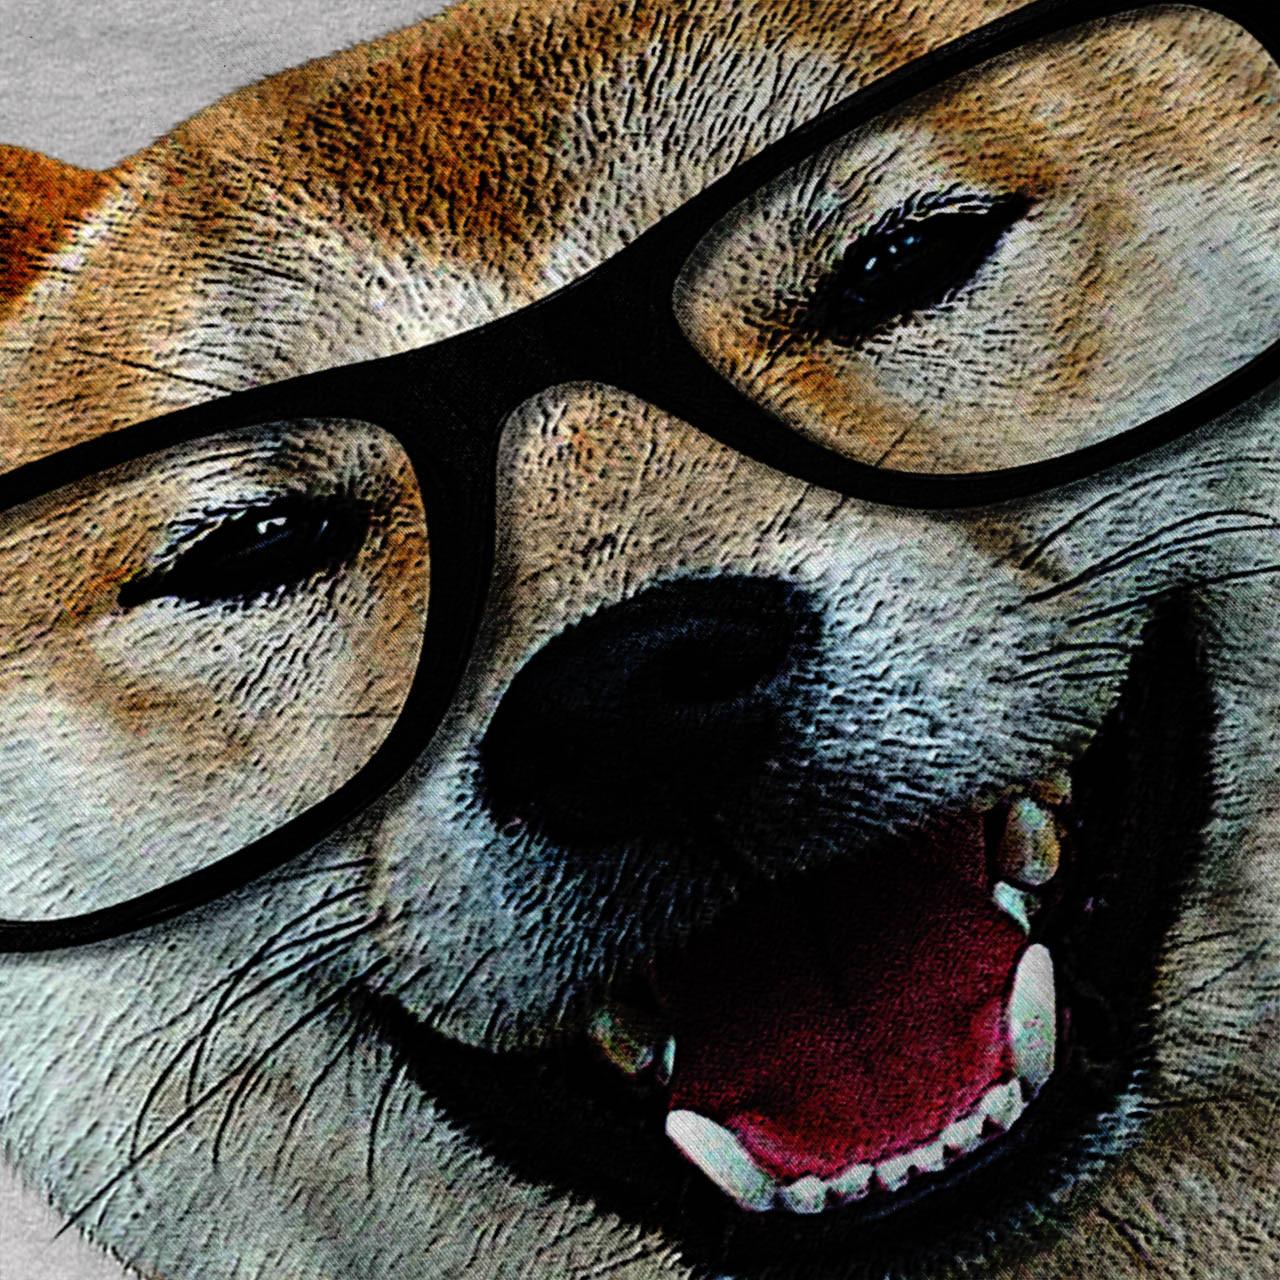 smart-shiba-inu-dog-t-shirt-design-close